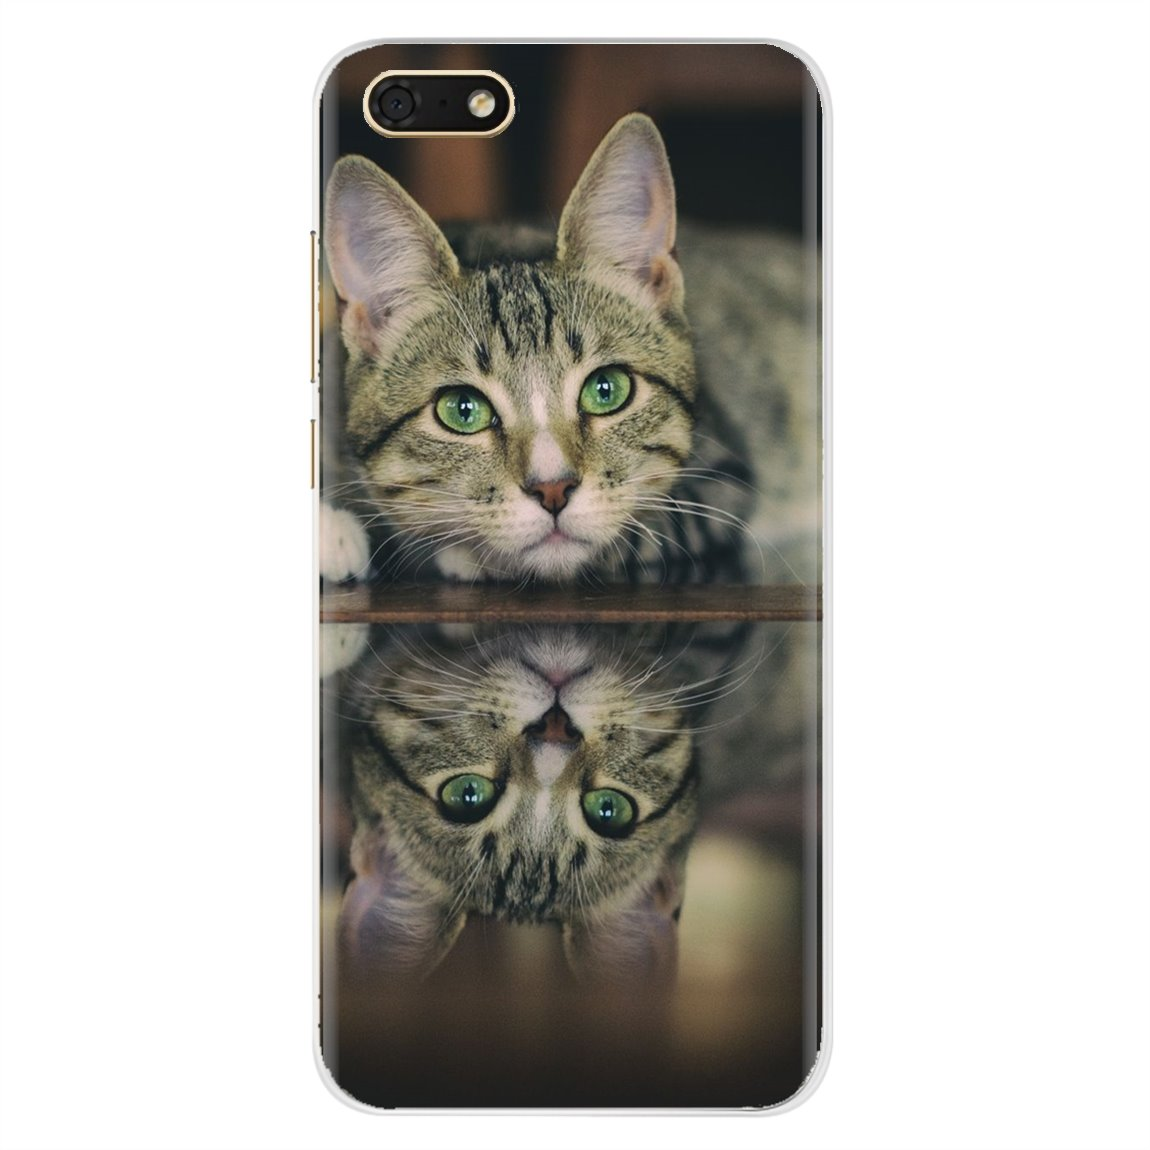 Bling caja del teléfono de silicona para HTC uno X9 M7 M8 A9 M9 M10 E9 más deseo 630, 530, 626, 628, 816, 820, 830 gato desgaste abuela gafas